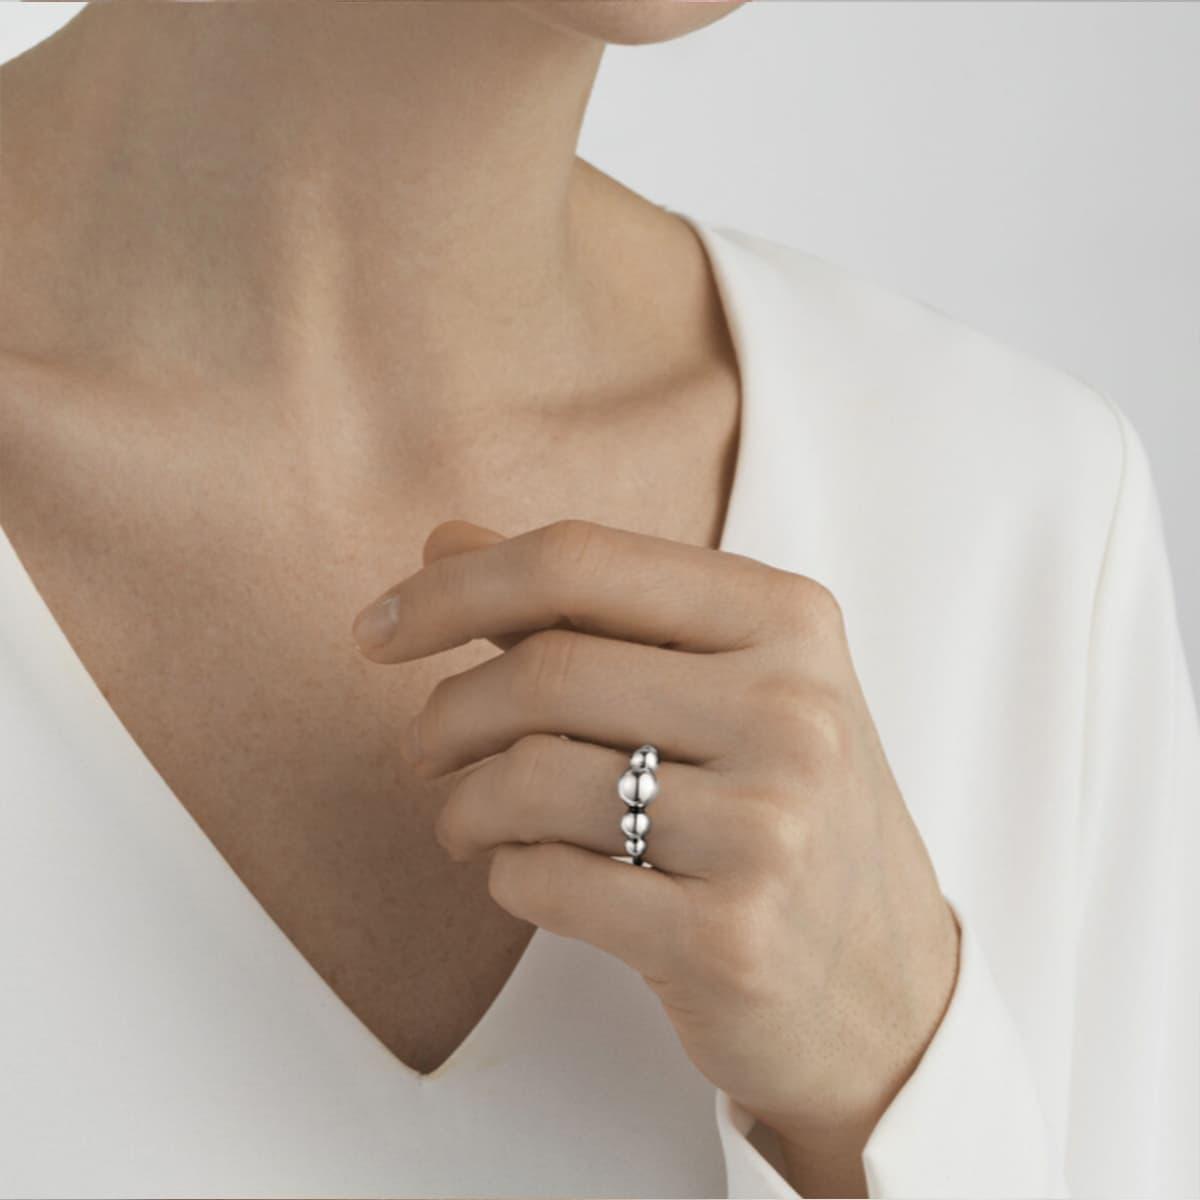 Moonlight Grapes Sterling Silver Ring